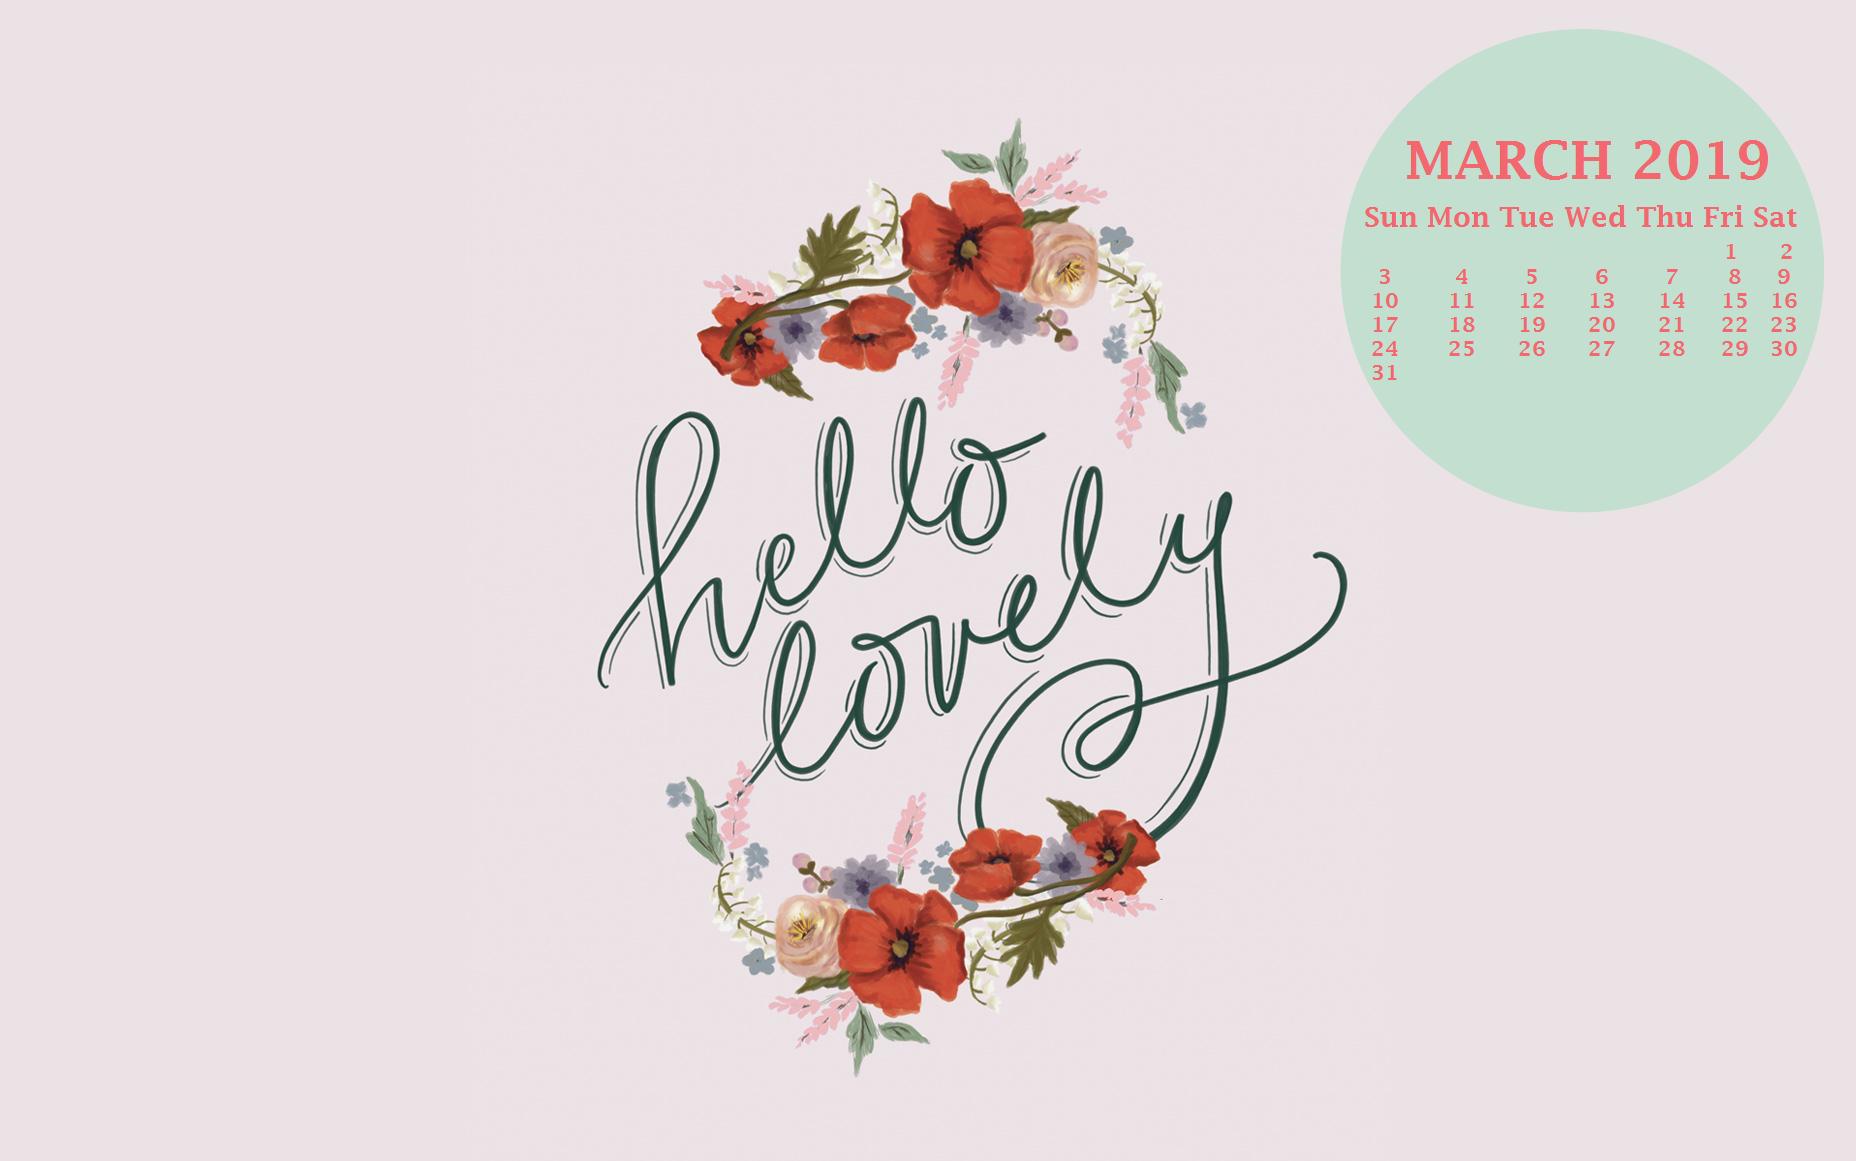 Free March 2019 Desktop Background